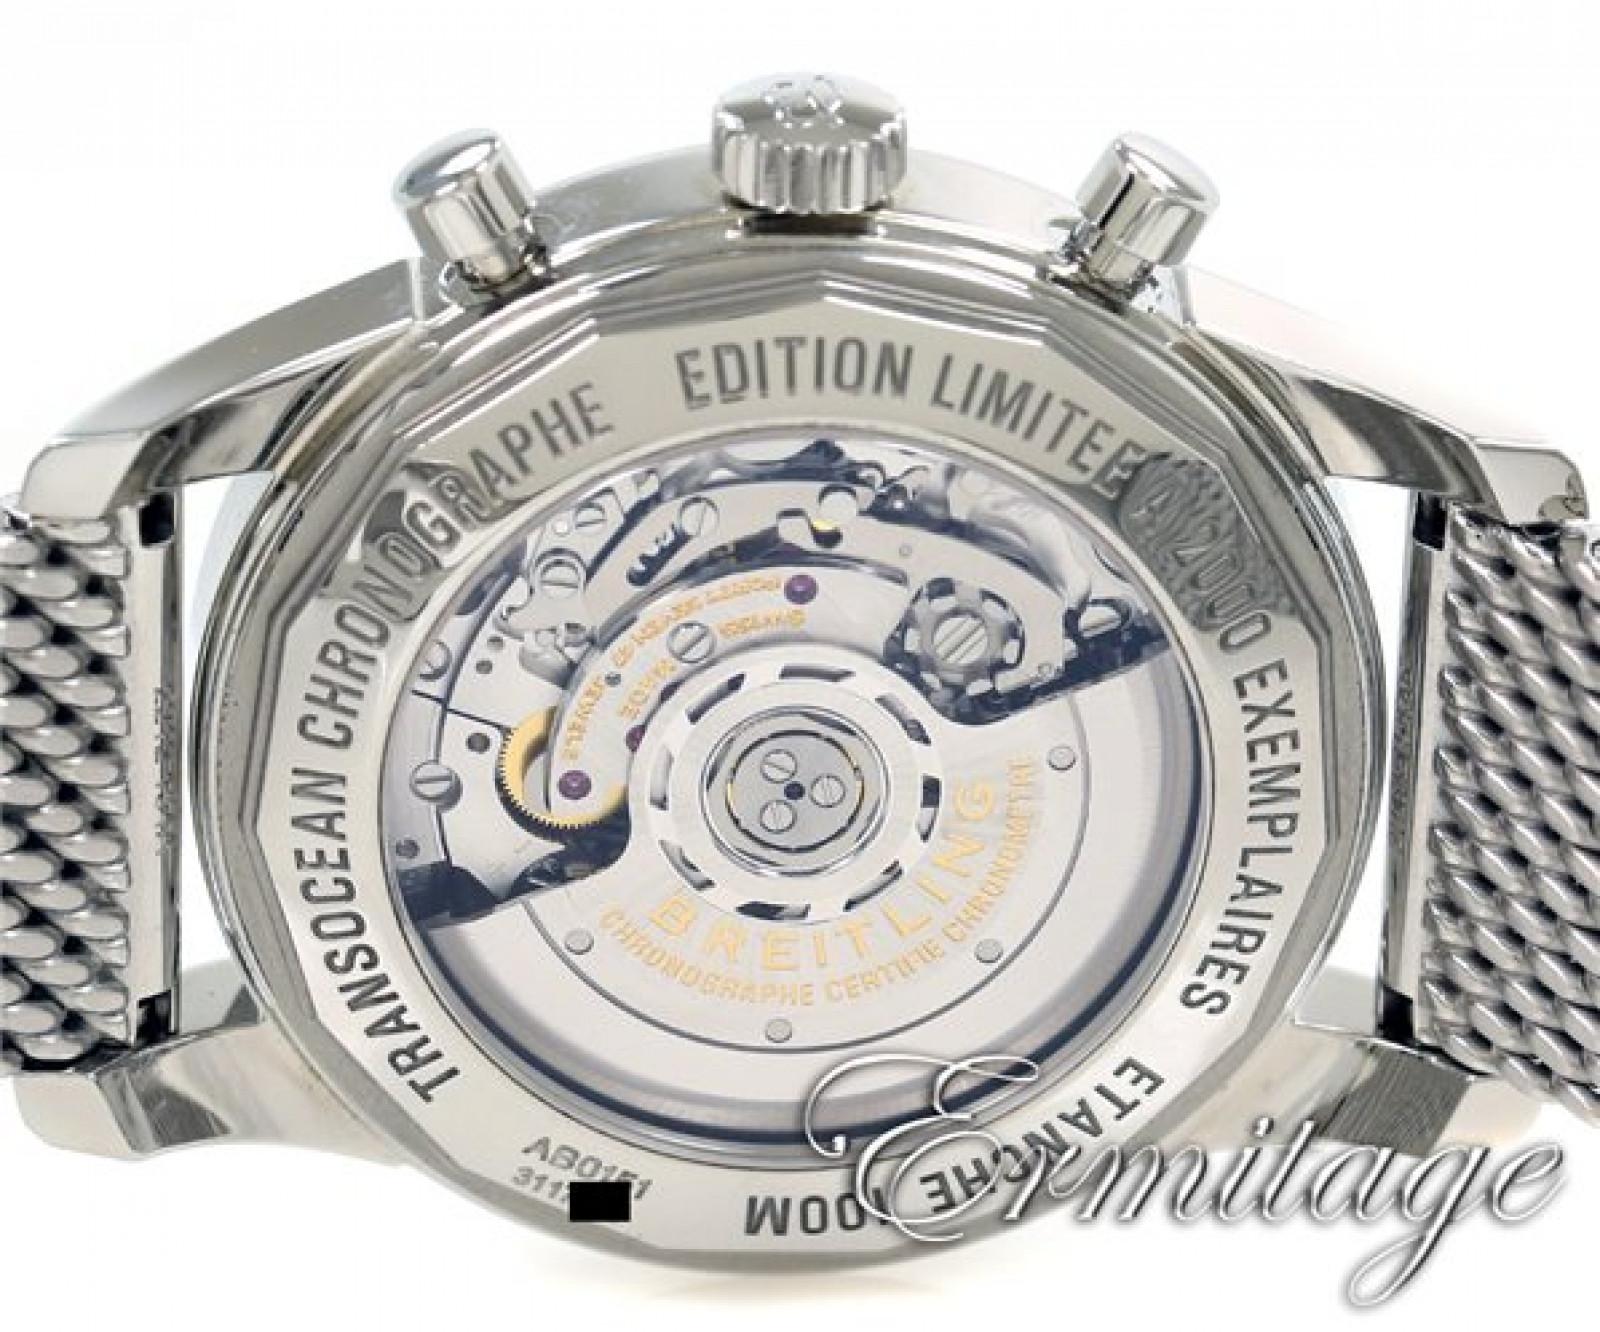 Breitling TransOcean Limited Edition AB015112/C860 Steel